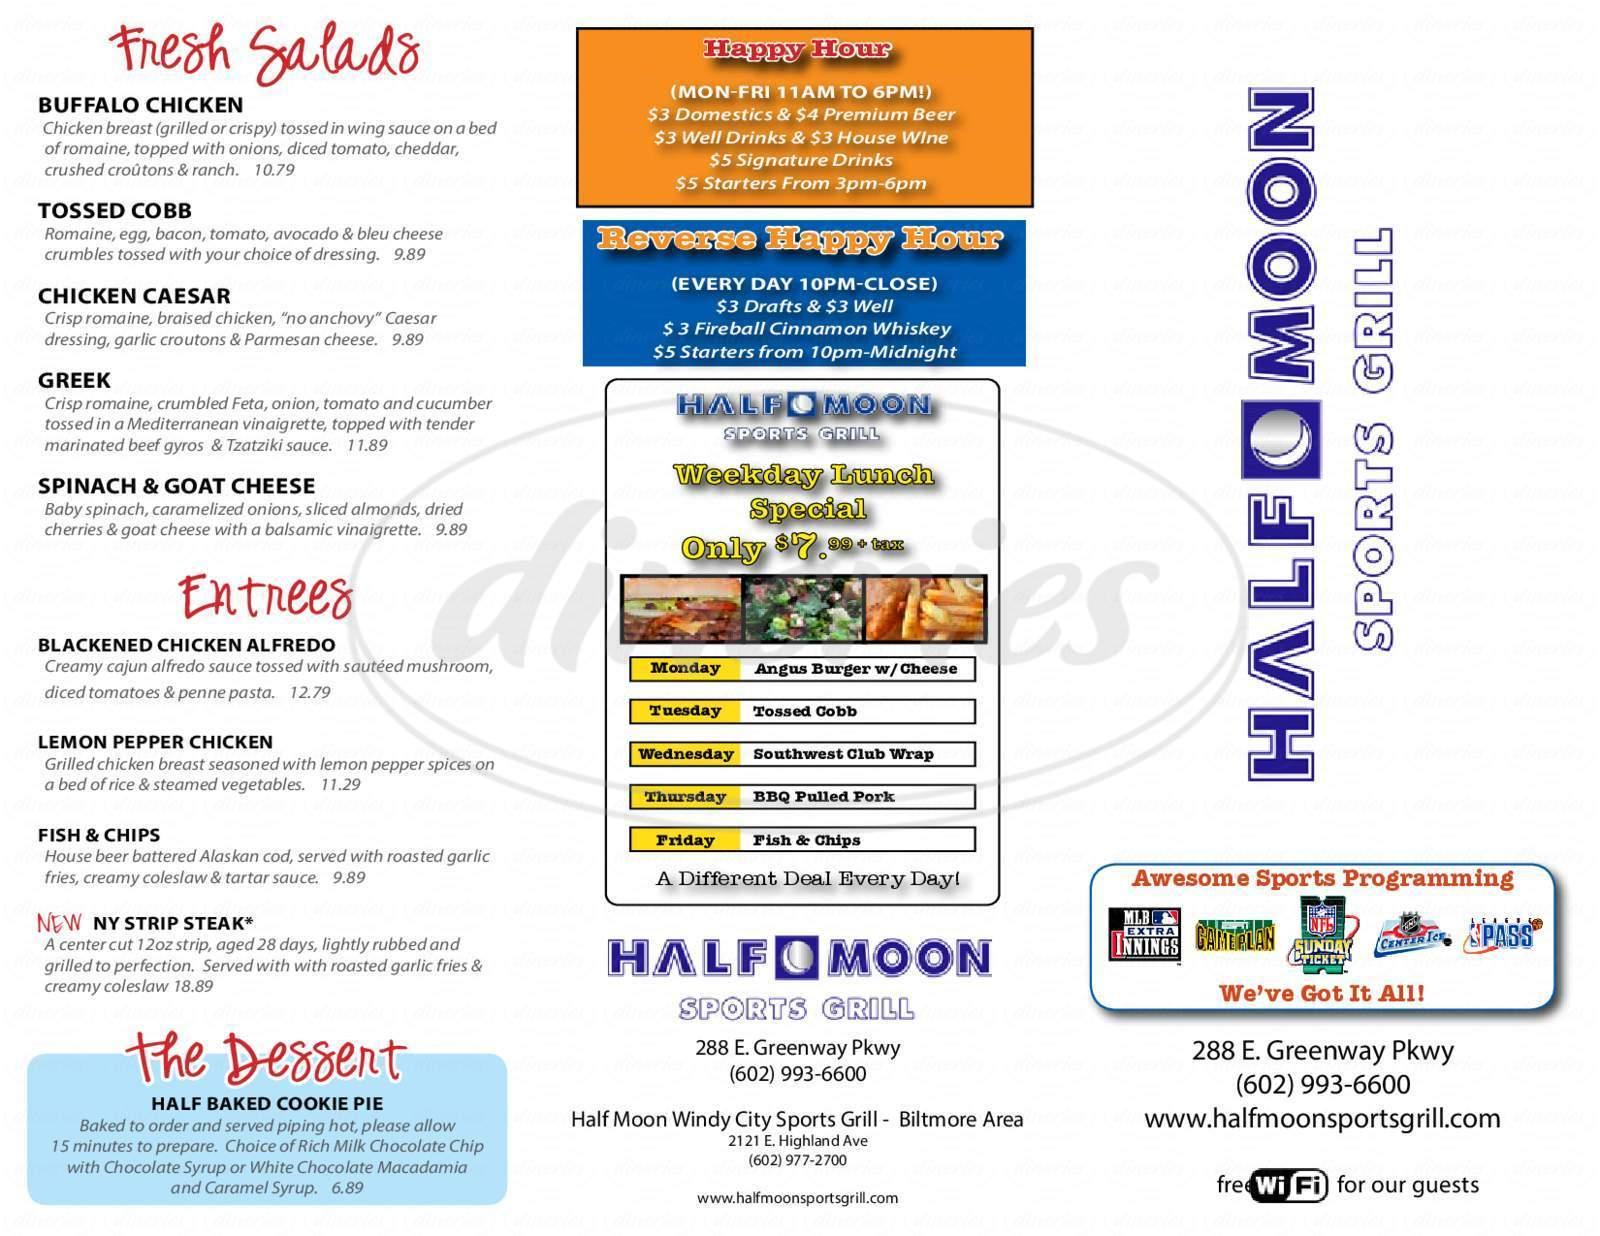 menu for Half Moon Sports Grill